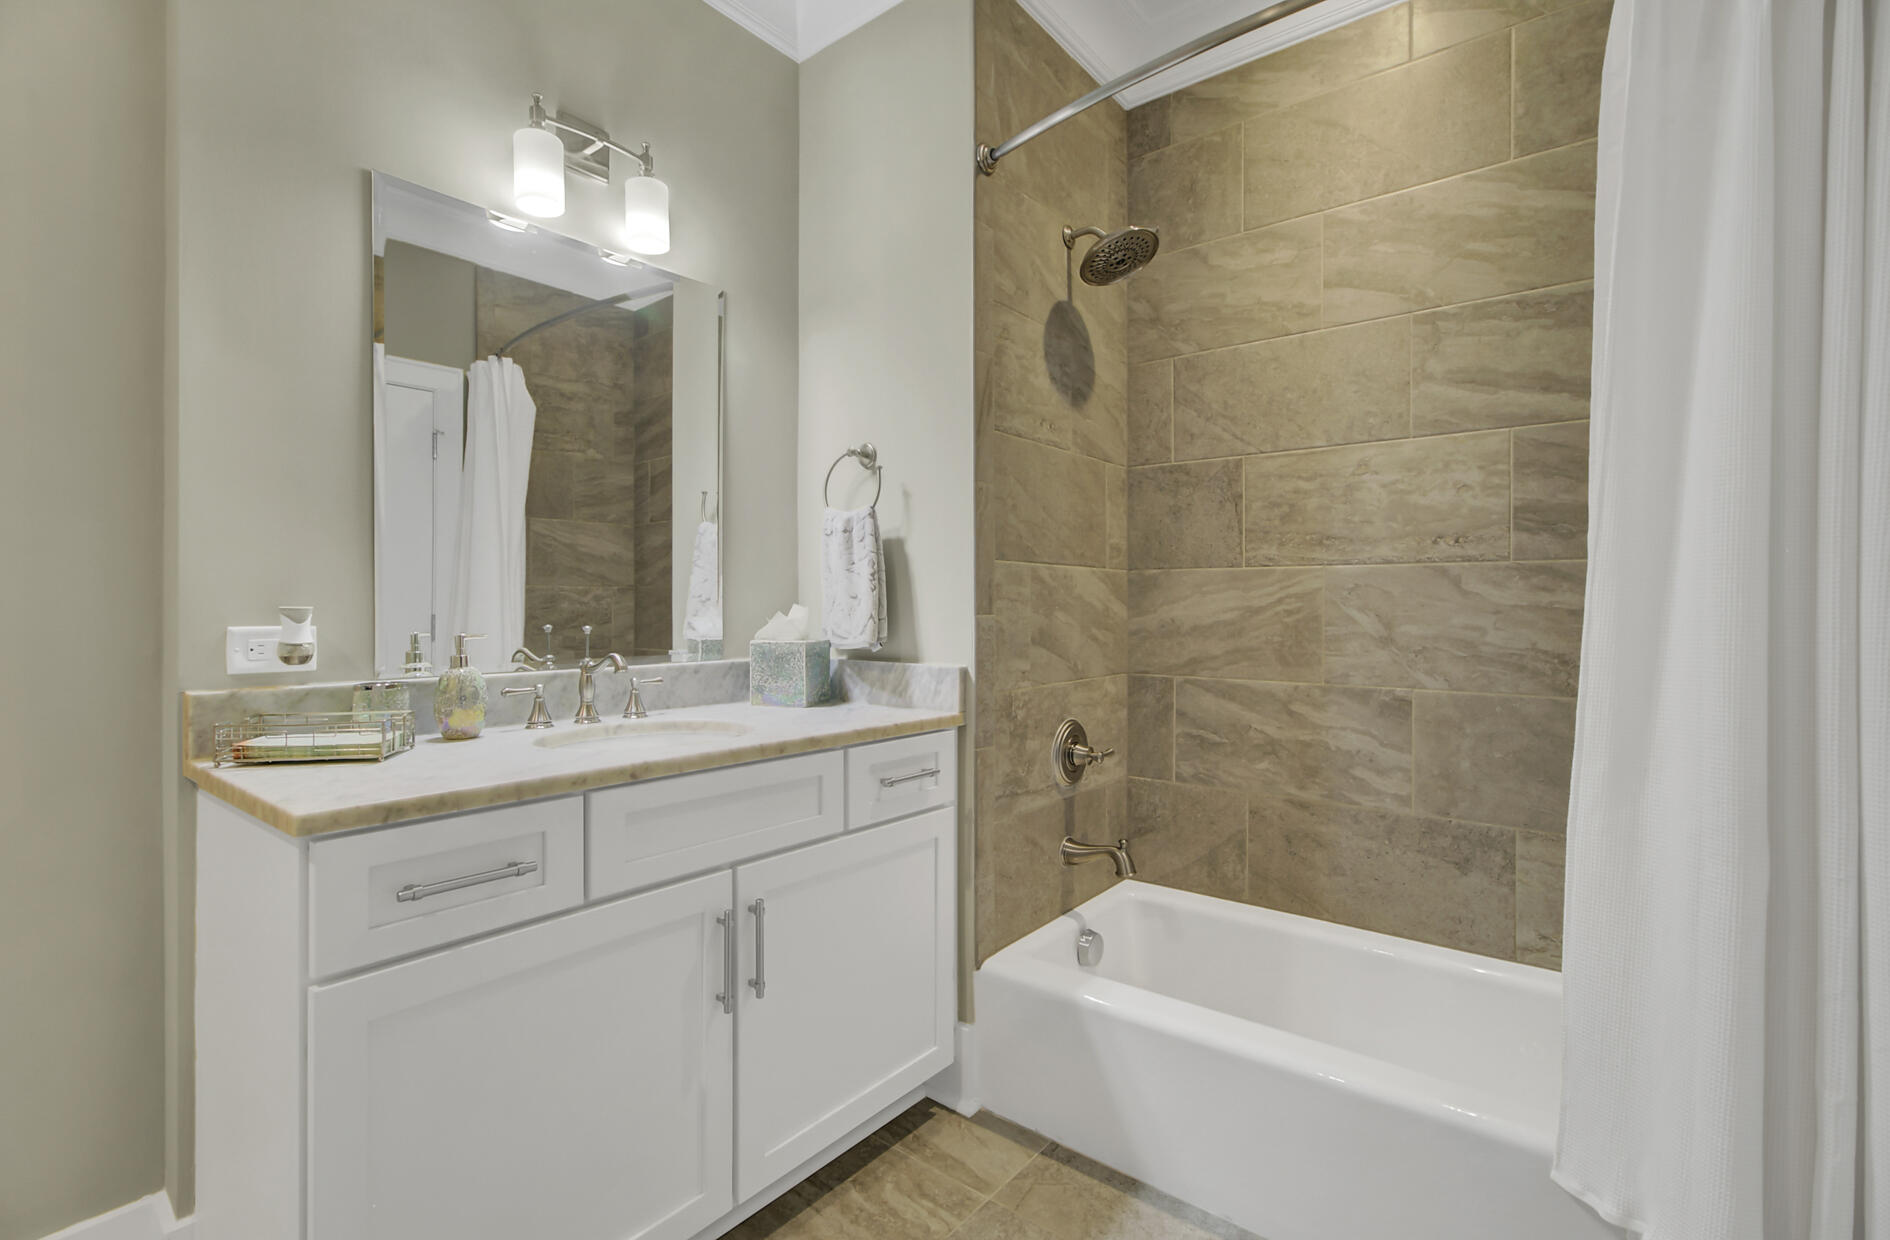 Tides IV Condominiums Homes For Sale - 155 Wingo Way, Mount Pleasant, SC - 21